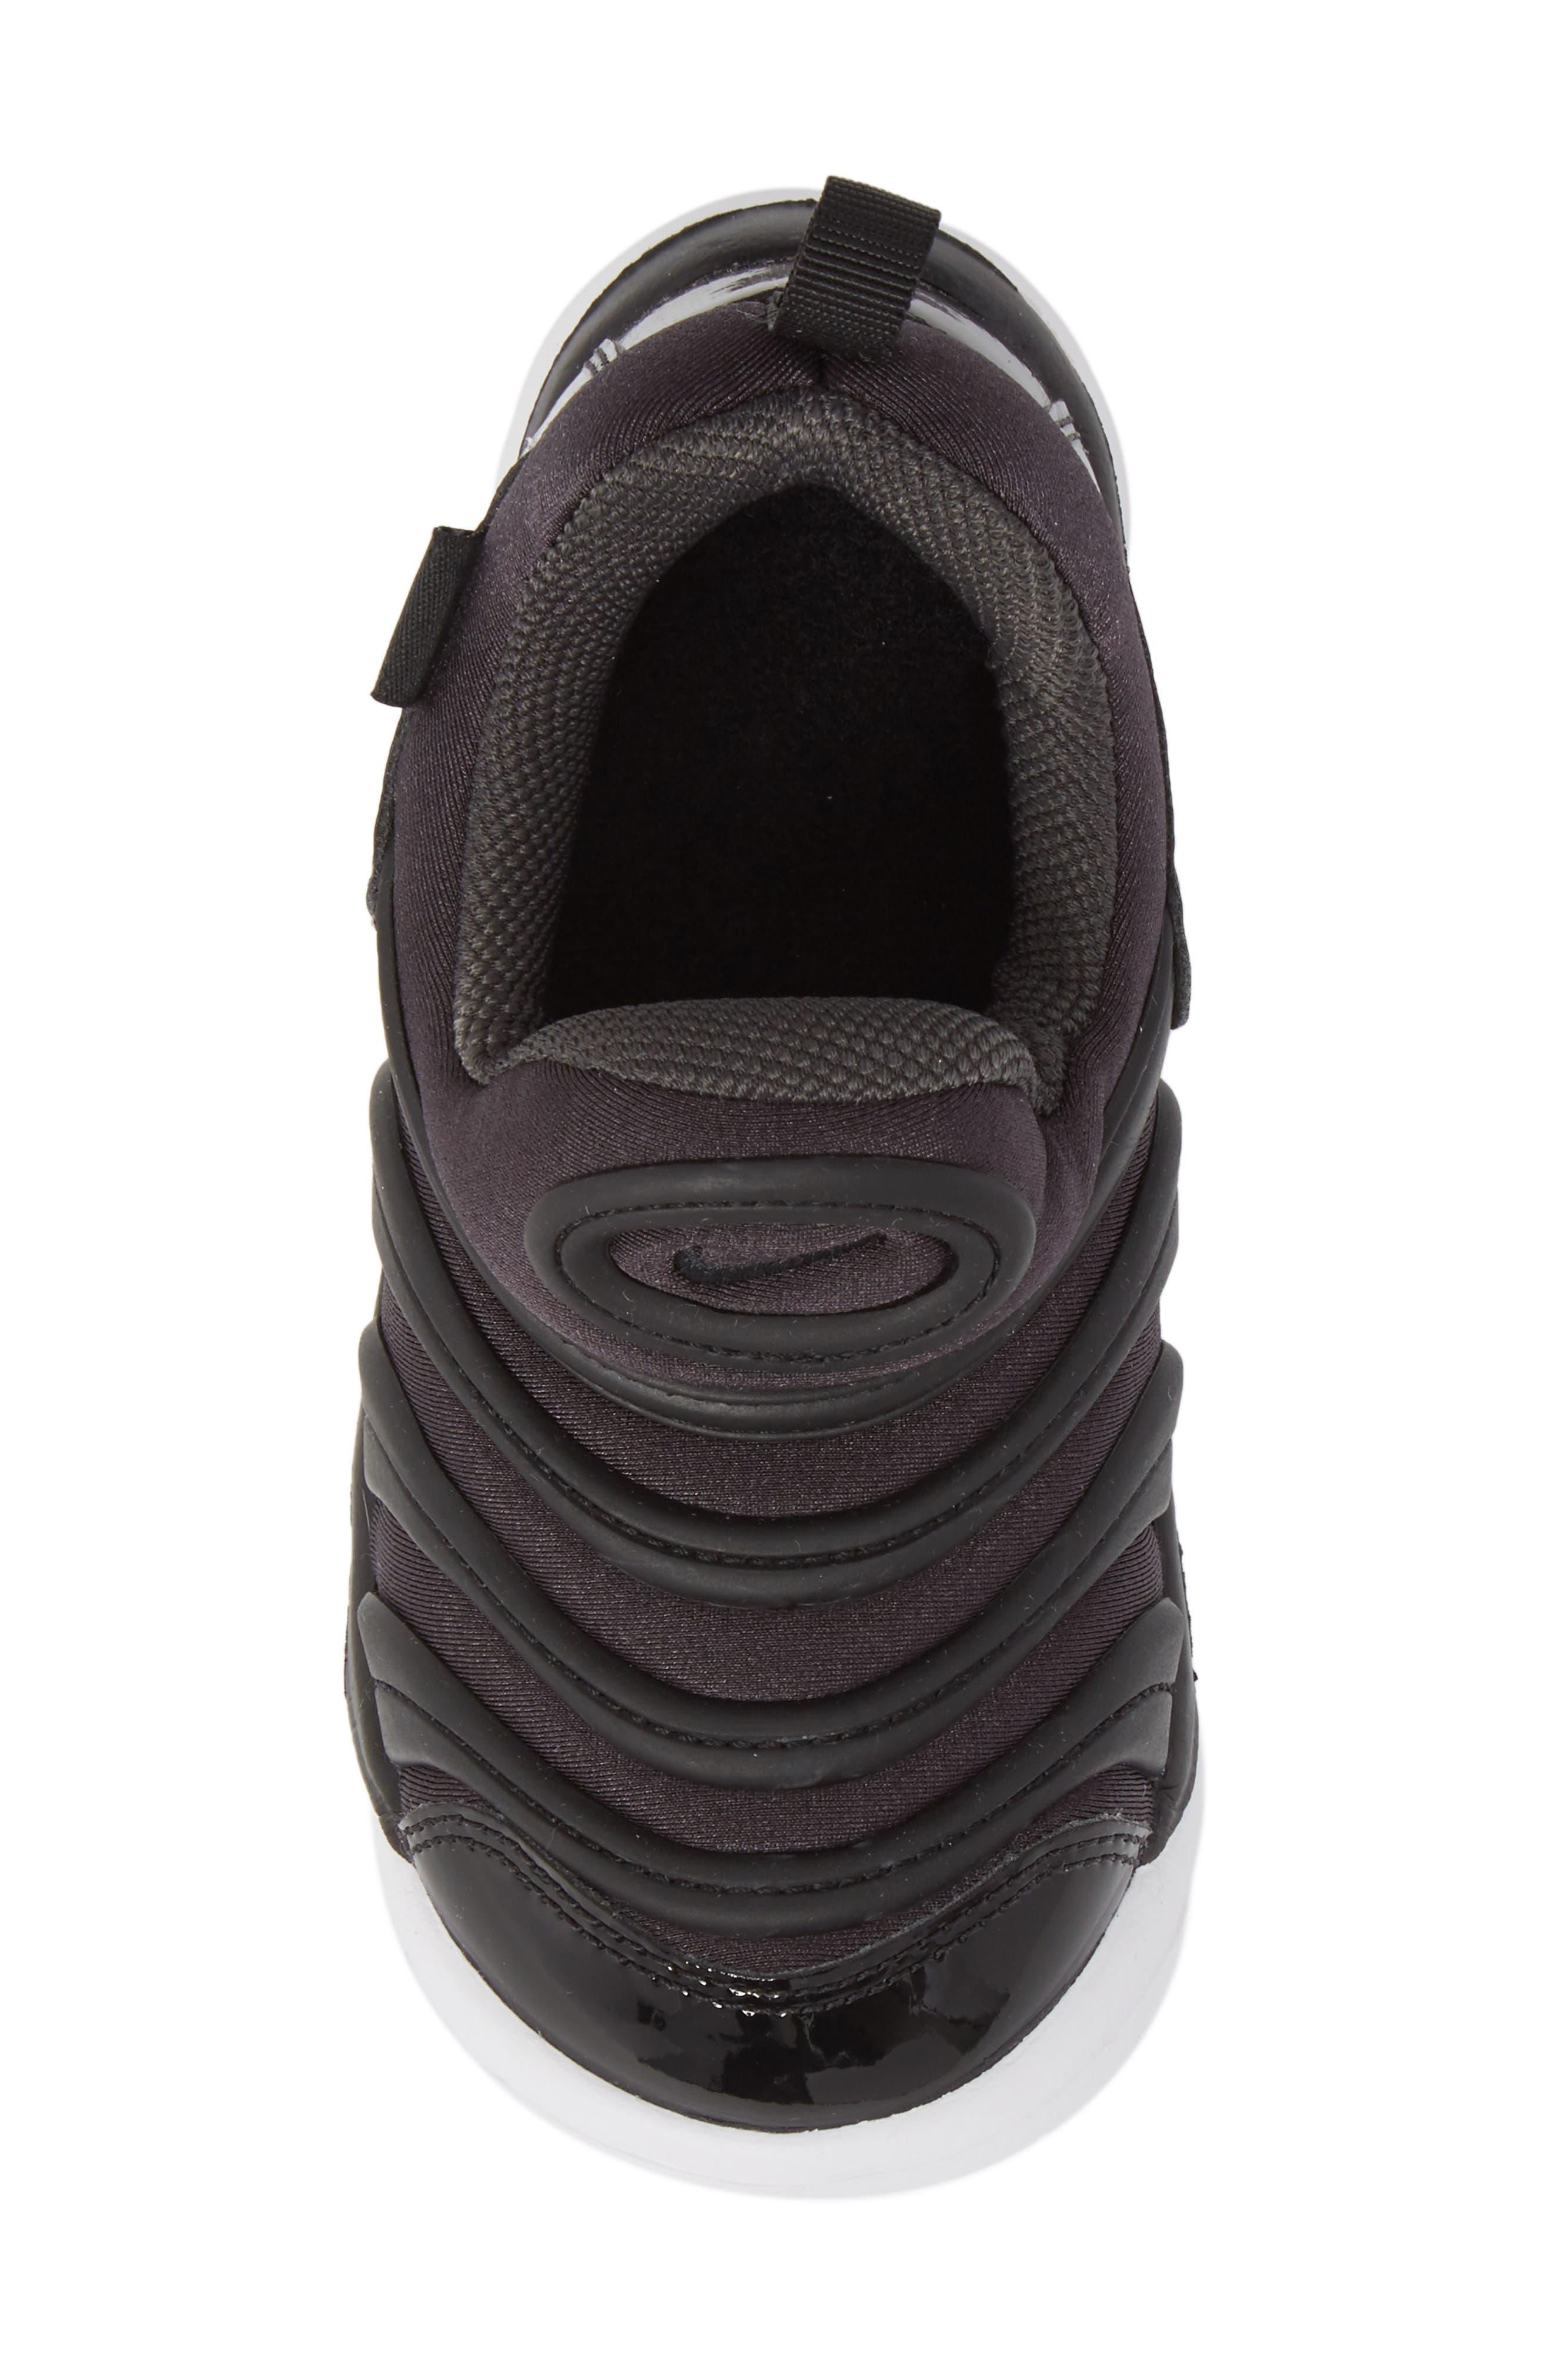 Dynamo Free Sneaker,                             Alternate thumbnail 5, color,                             ANTHRACITE/ WHITE/ BLACK